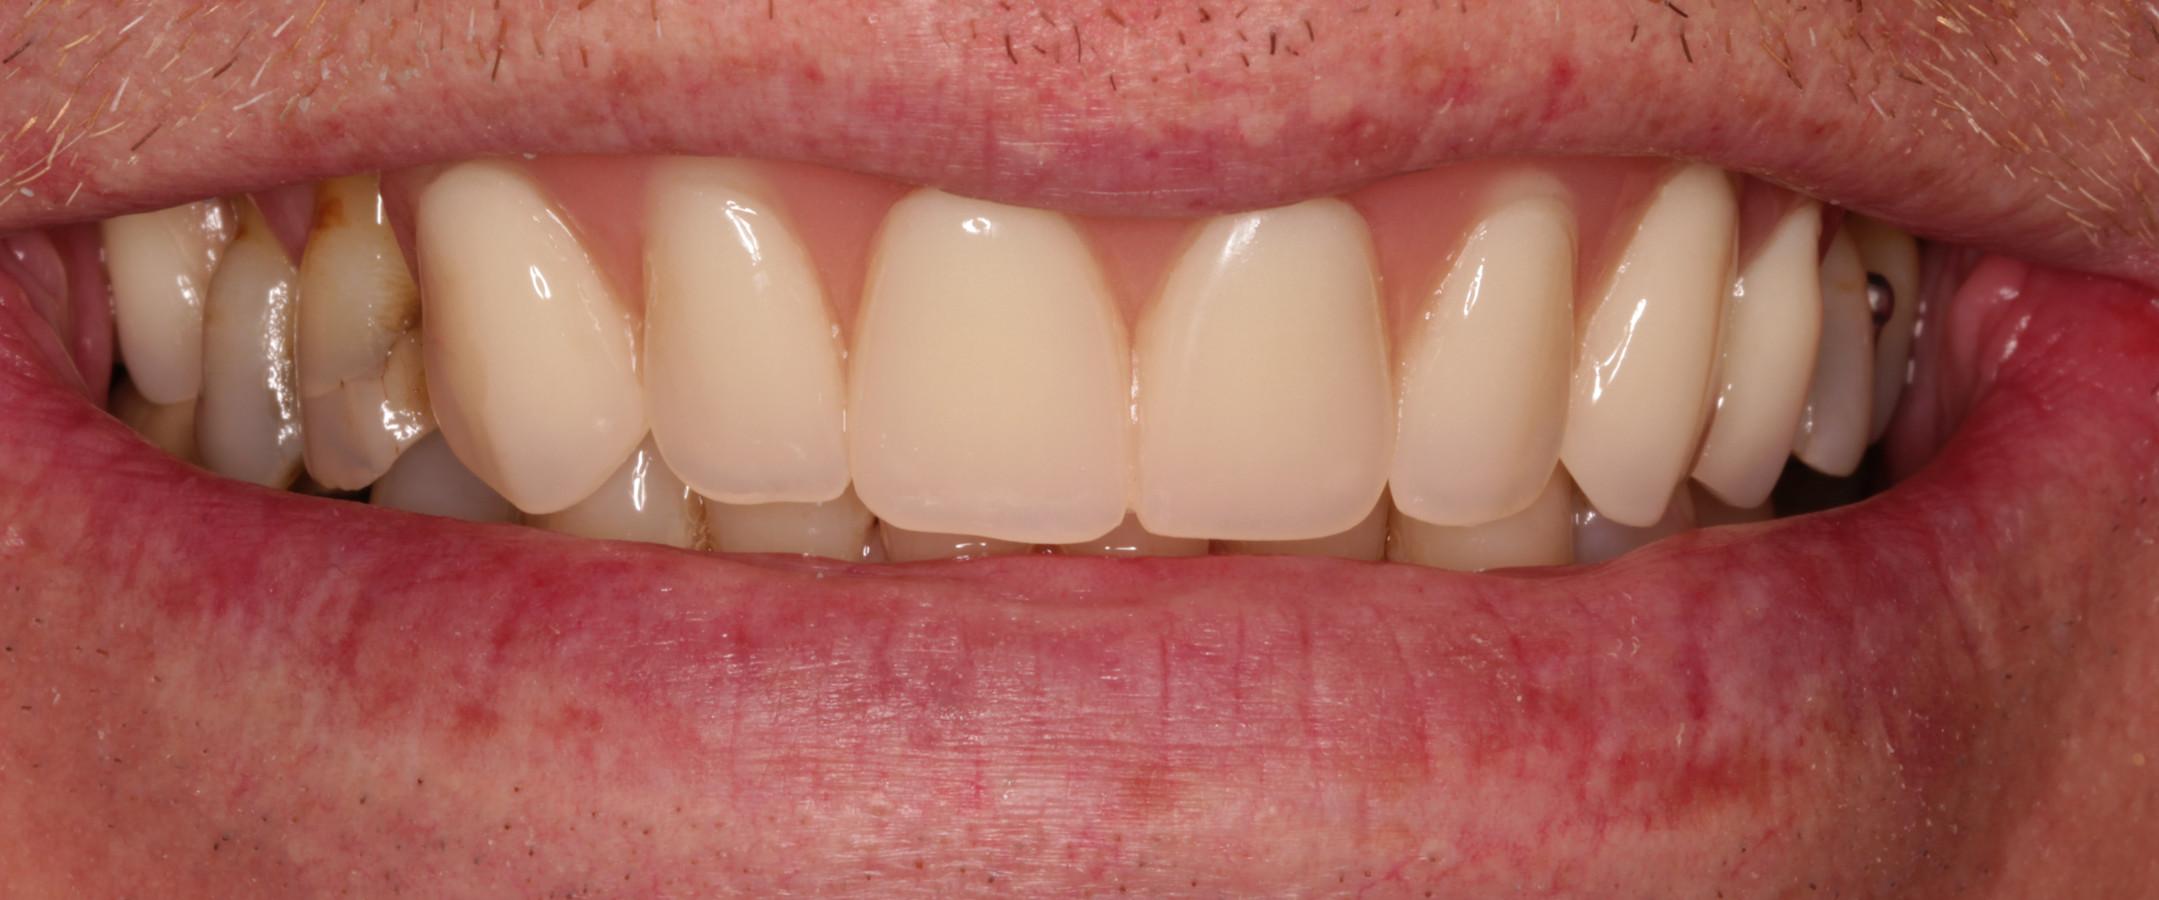 Temporary Denture